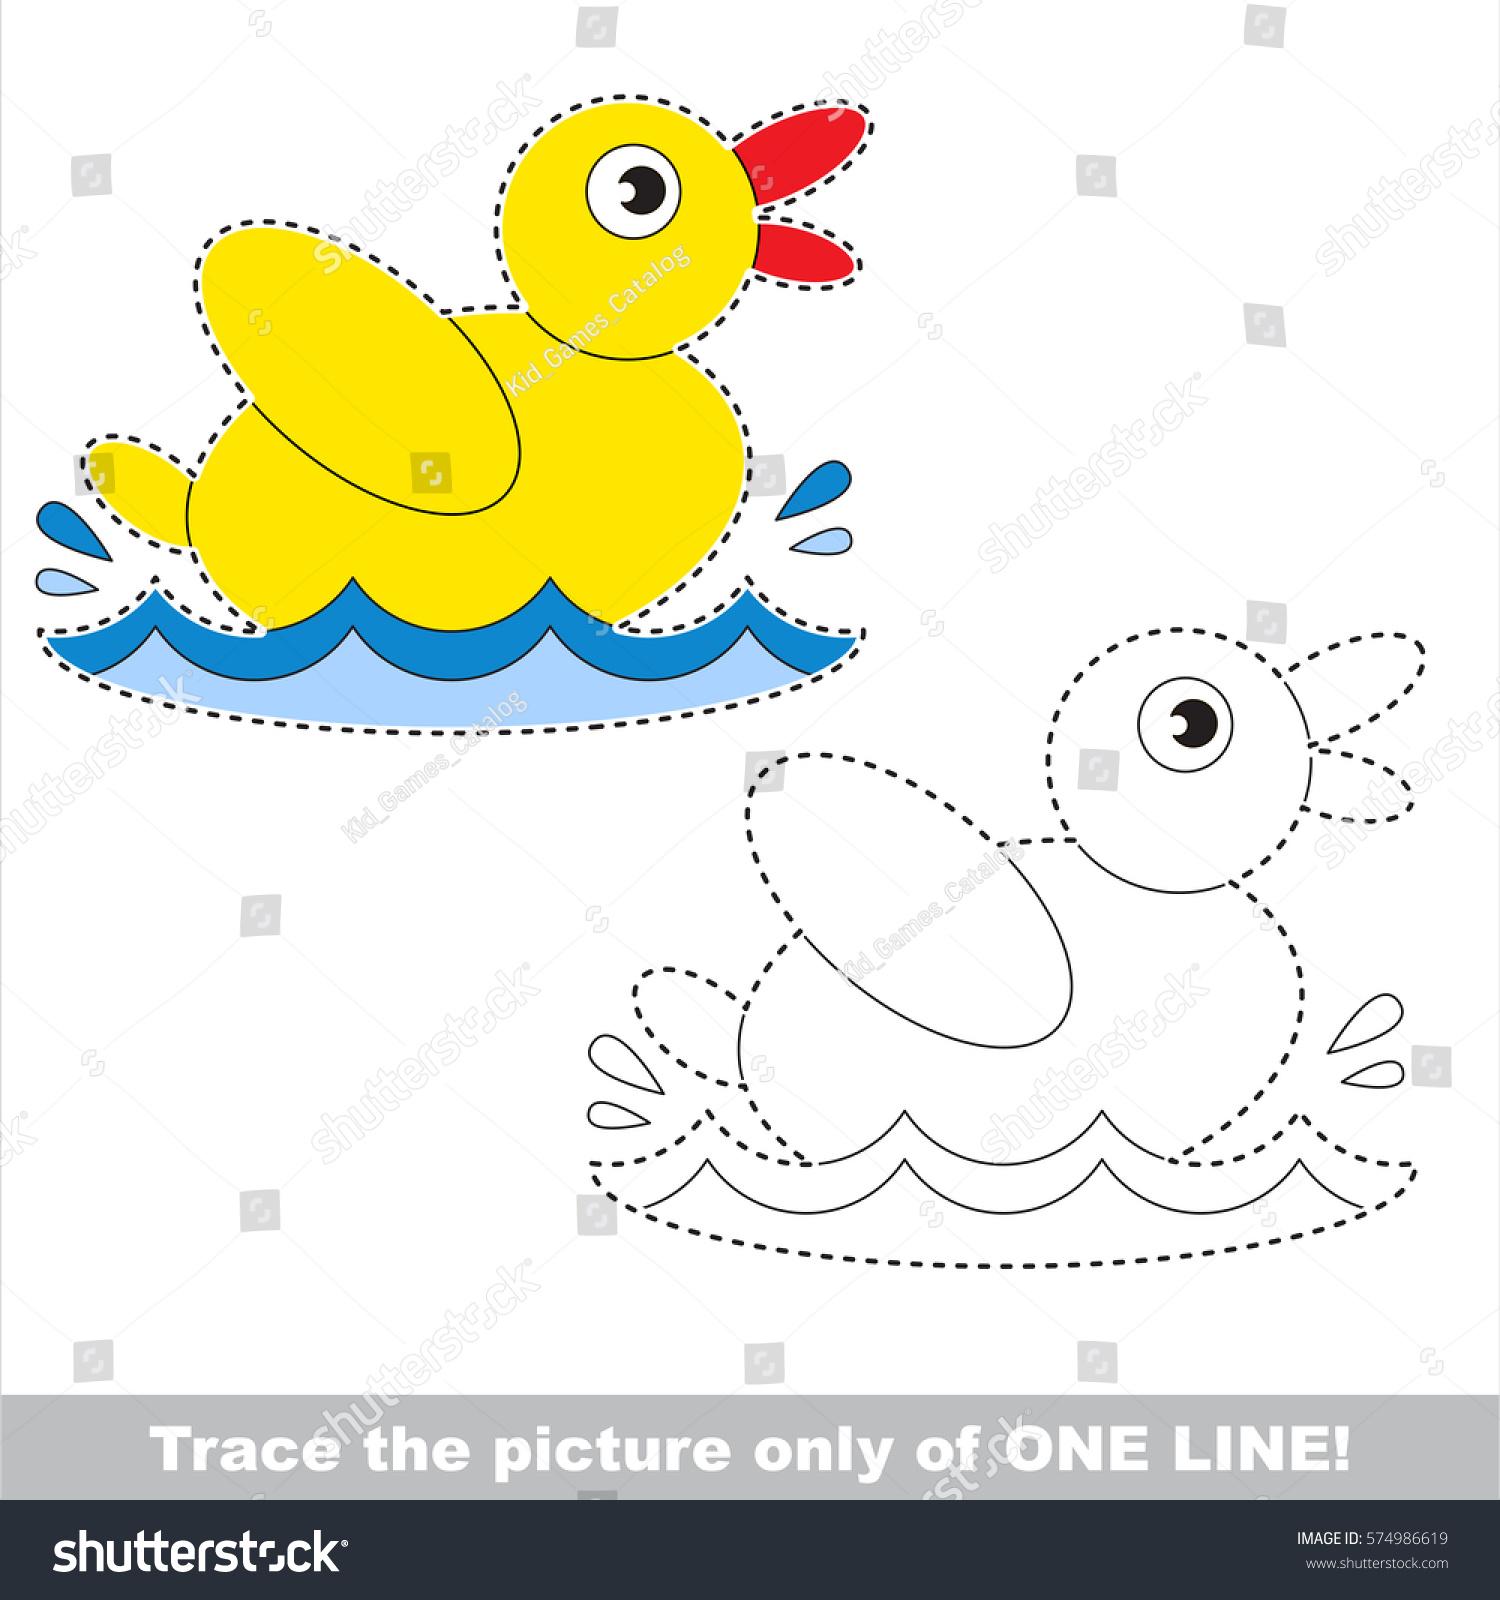 Yellow Duck Dot Dot Educational Game Stock Vector